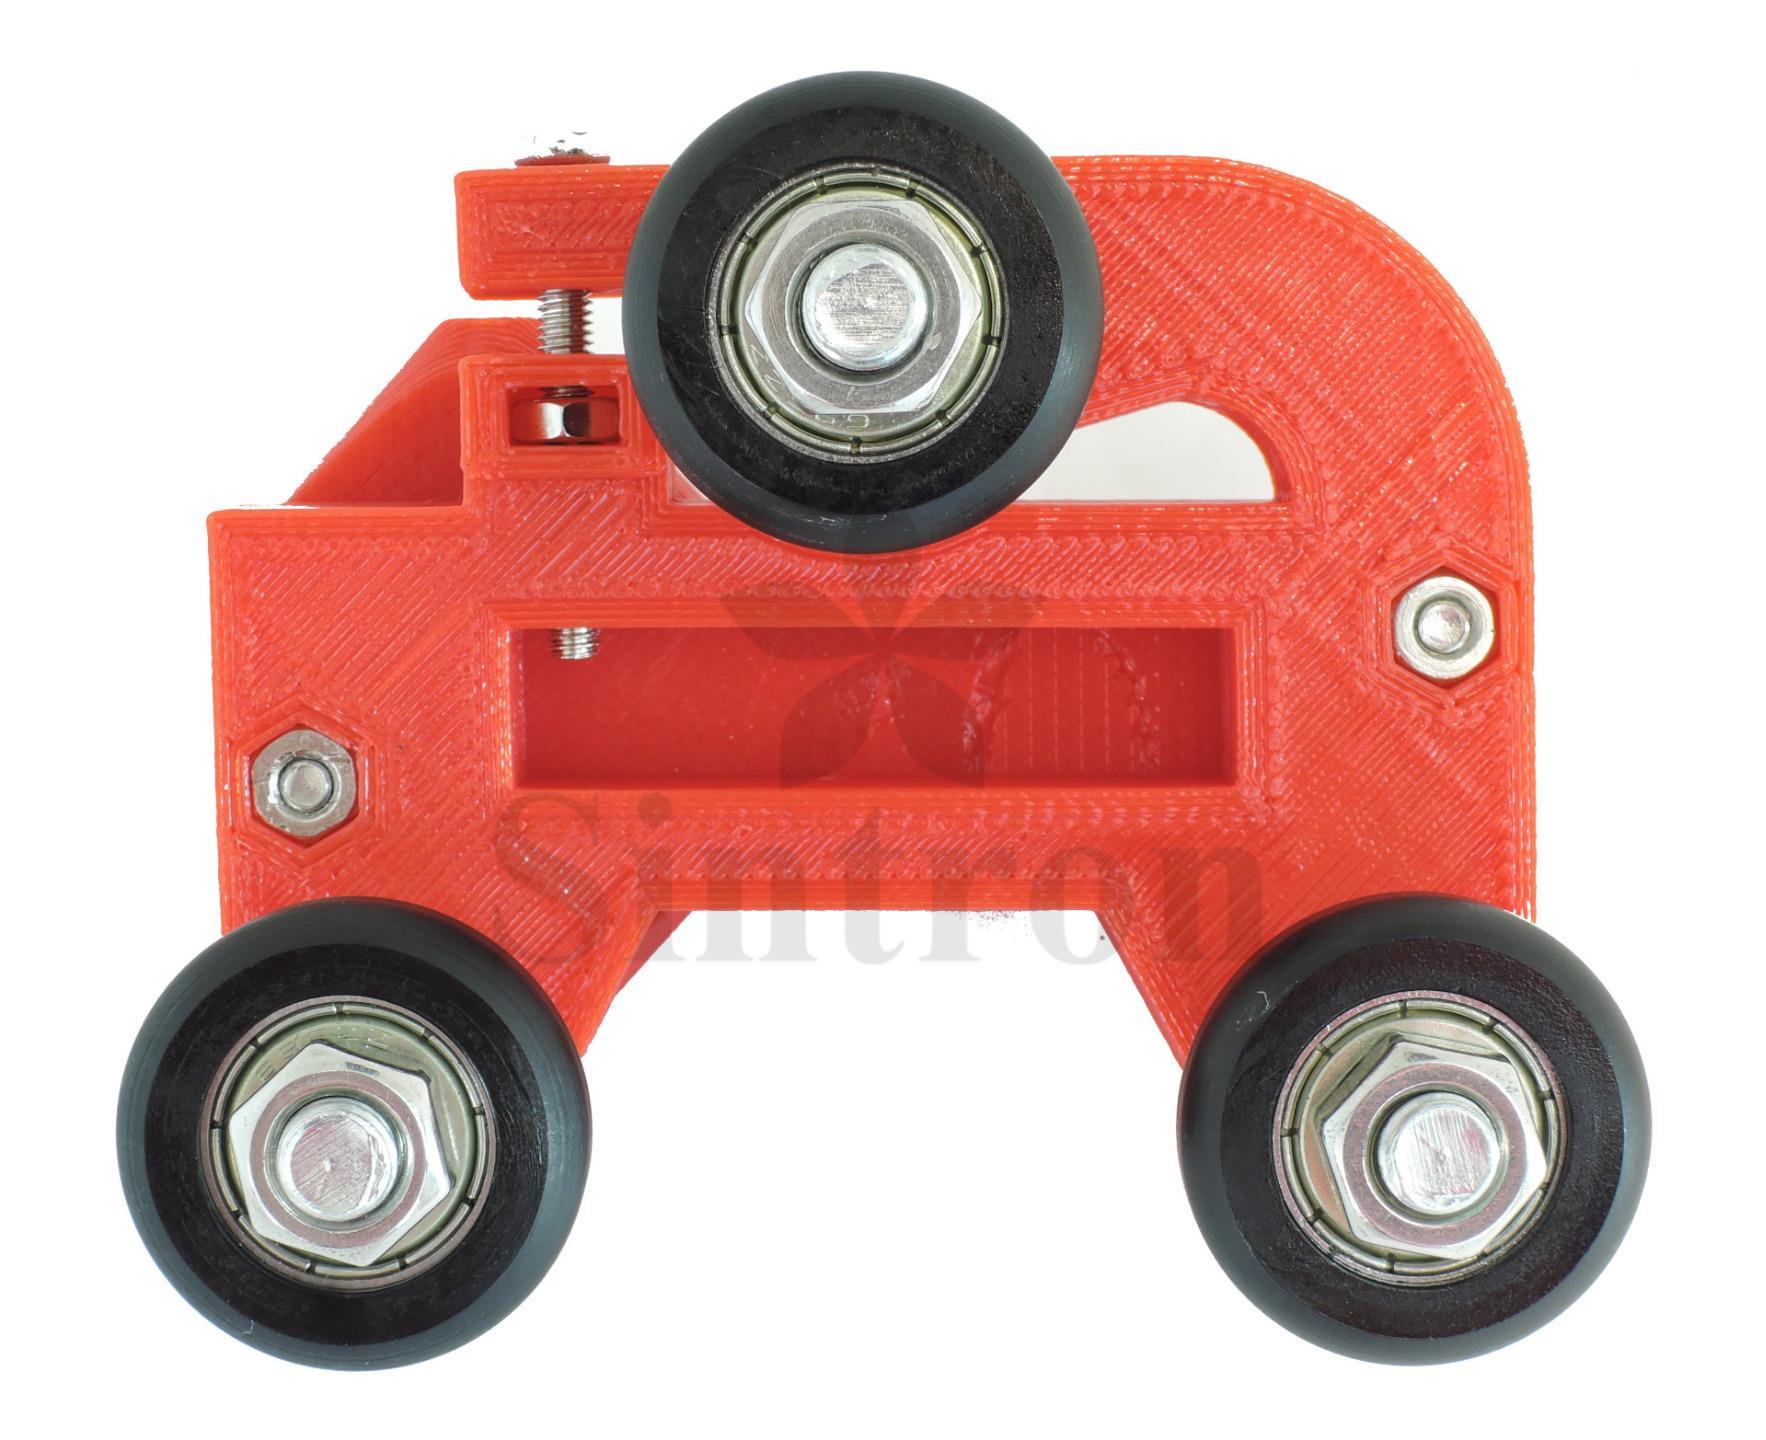 kossel mini prime line wheel carriage 696zz bearing. Black Bedroom Furniture Sets. Home Design Ideas